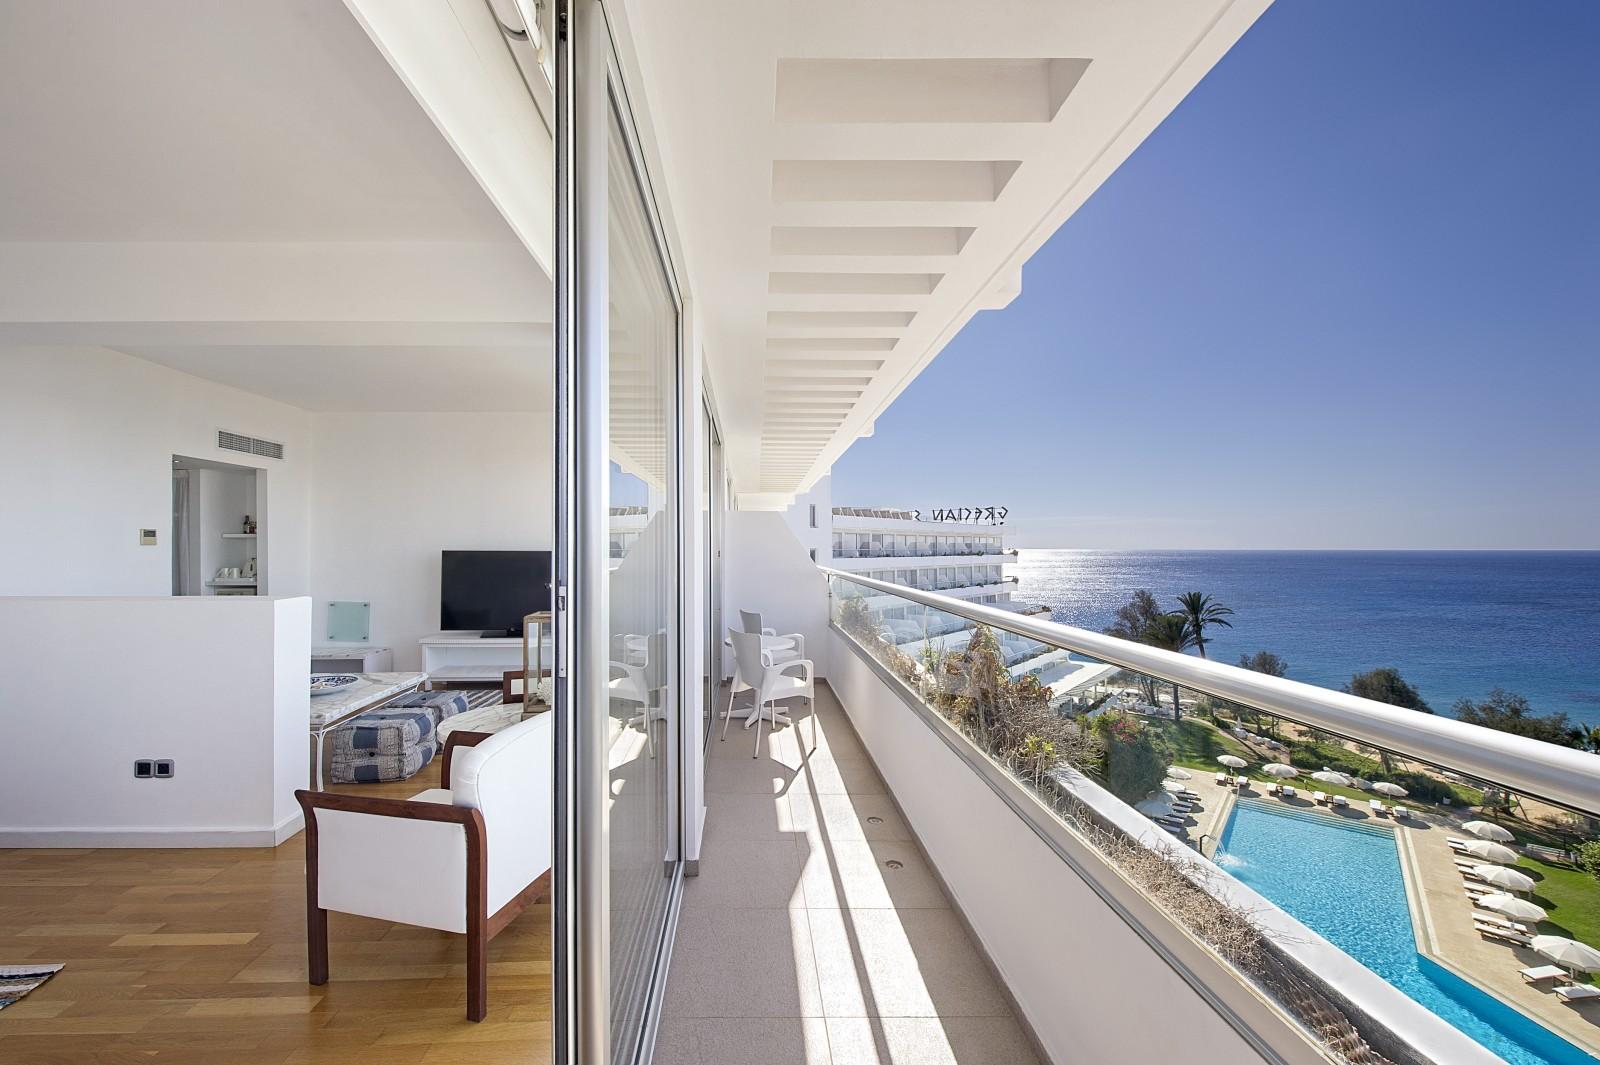 LATO 2018: Grecian Sands Hotel****, 7 dni (07-14.09.2018 r.), śniadania: 3549,00 PLN/osoba